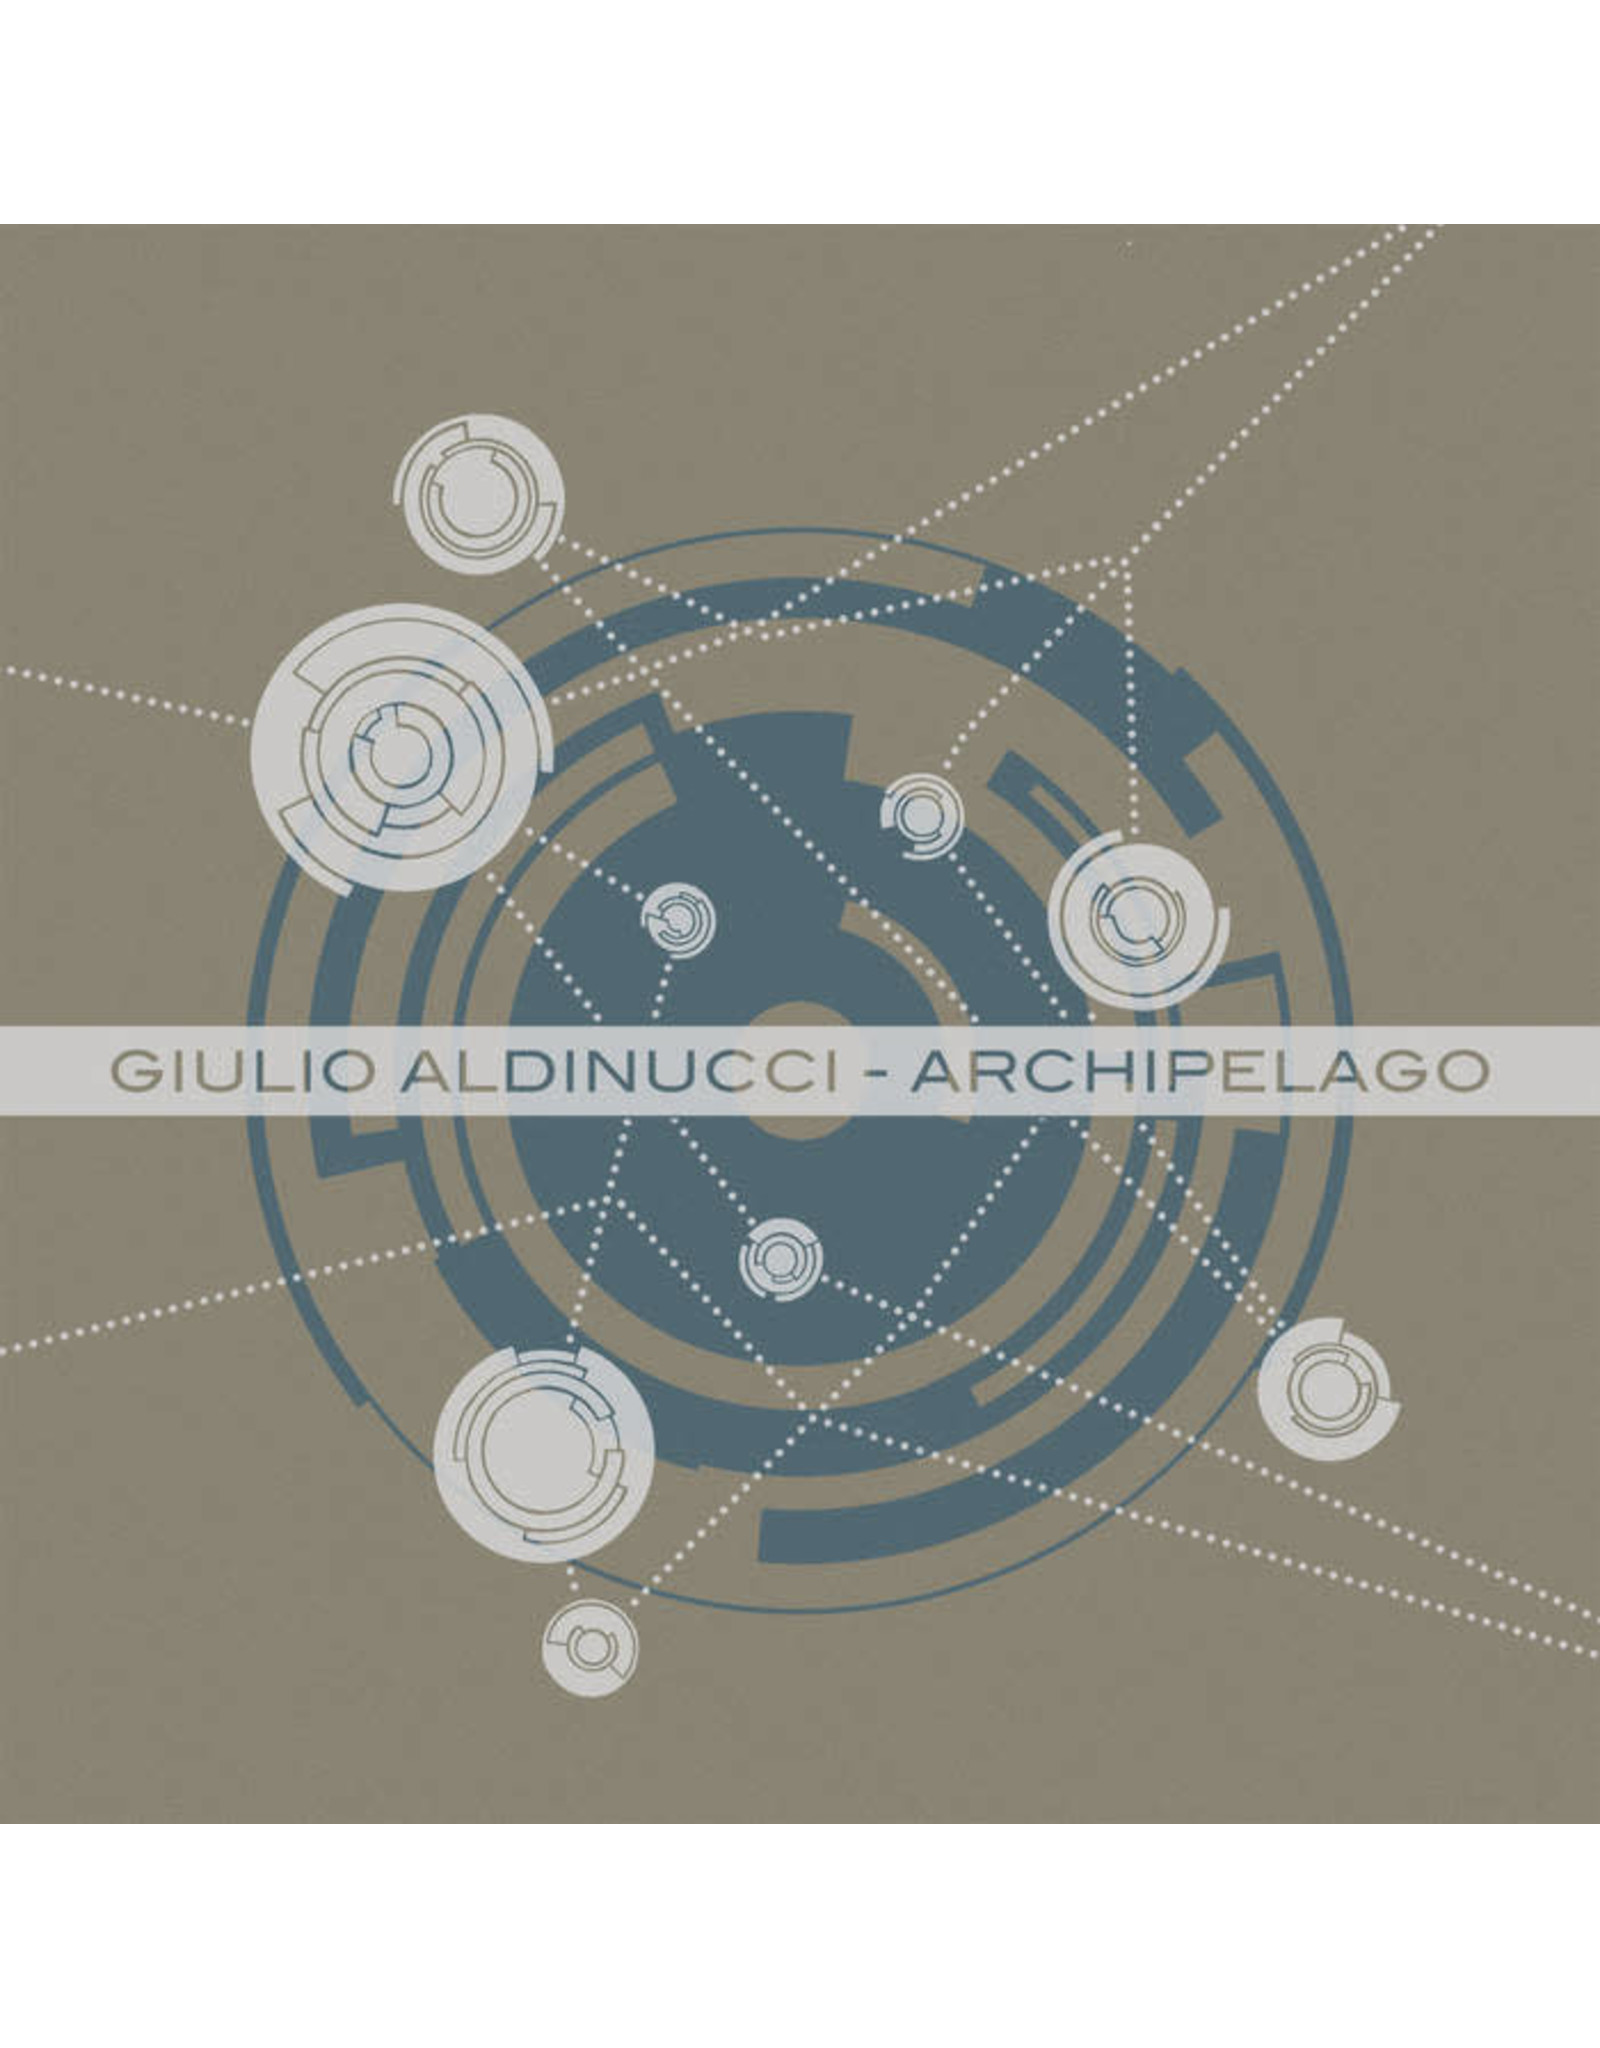 New Cassette Giulio Aldinucci - Archipelago CS